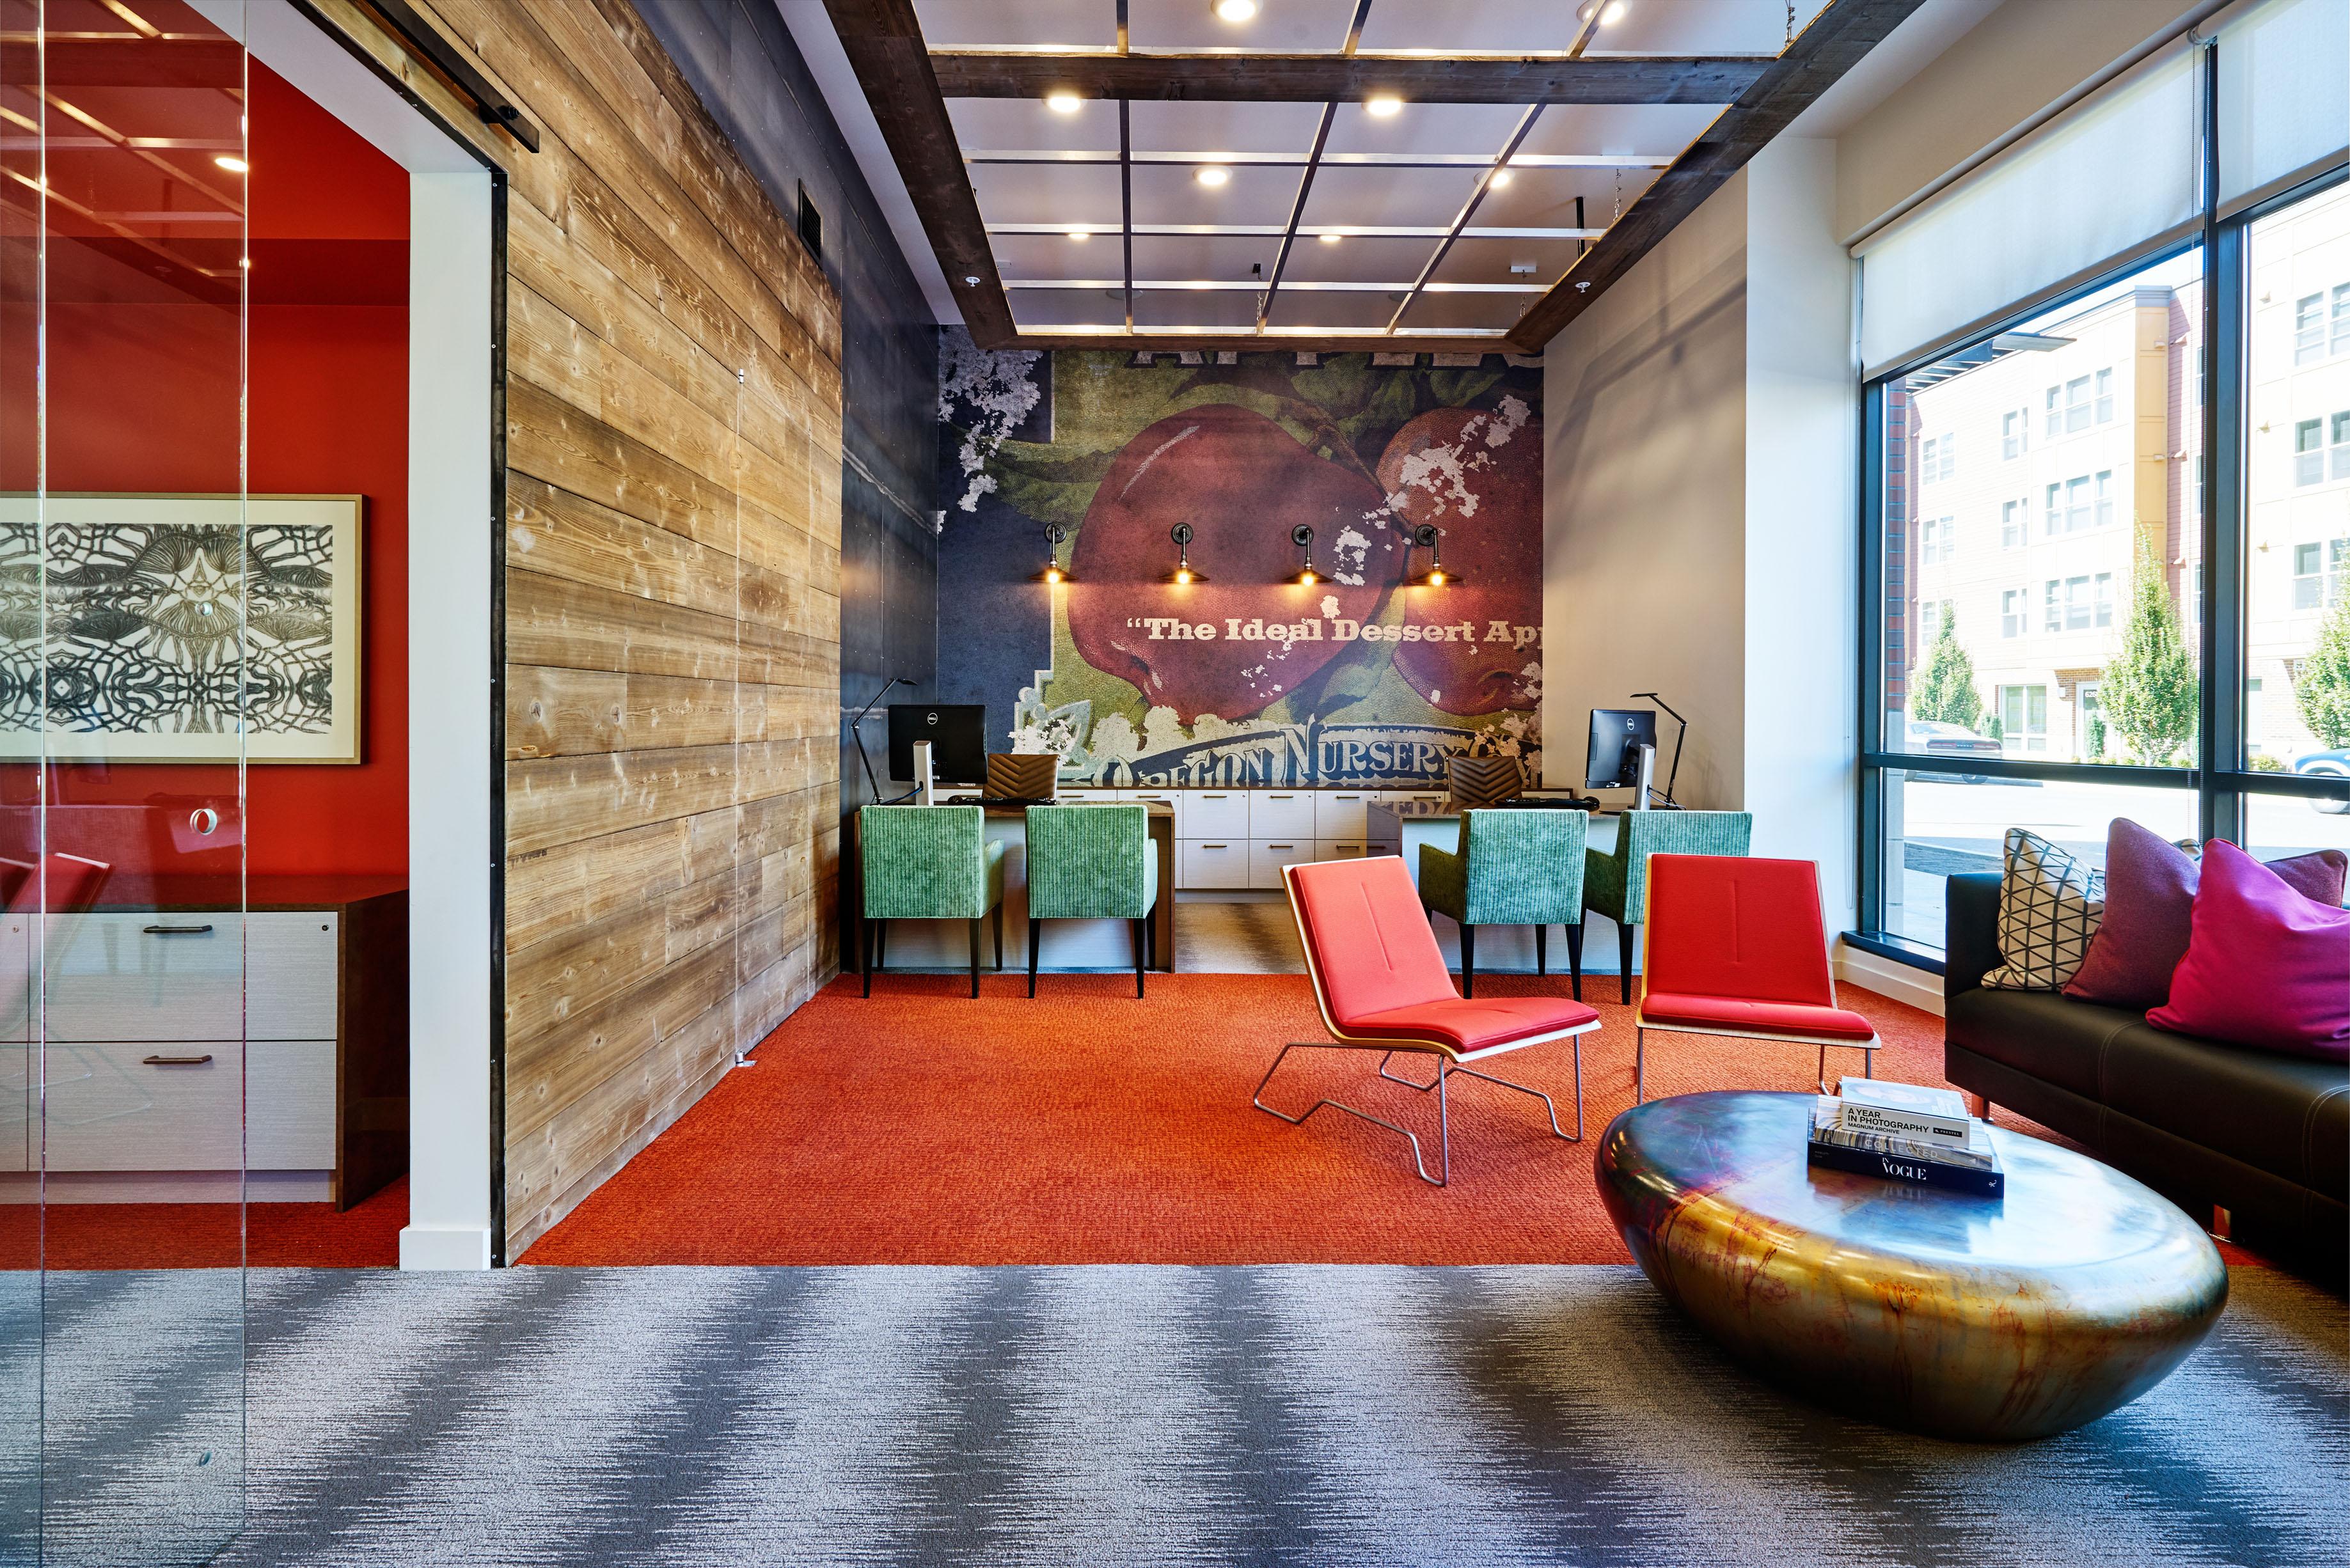 Best Corridor Design: Portland Interior Design Firm Uses Creative Color